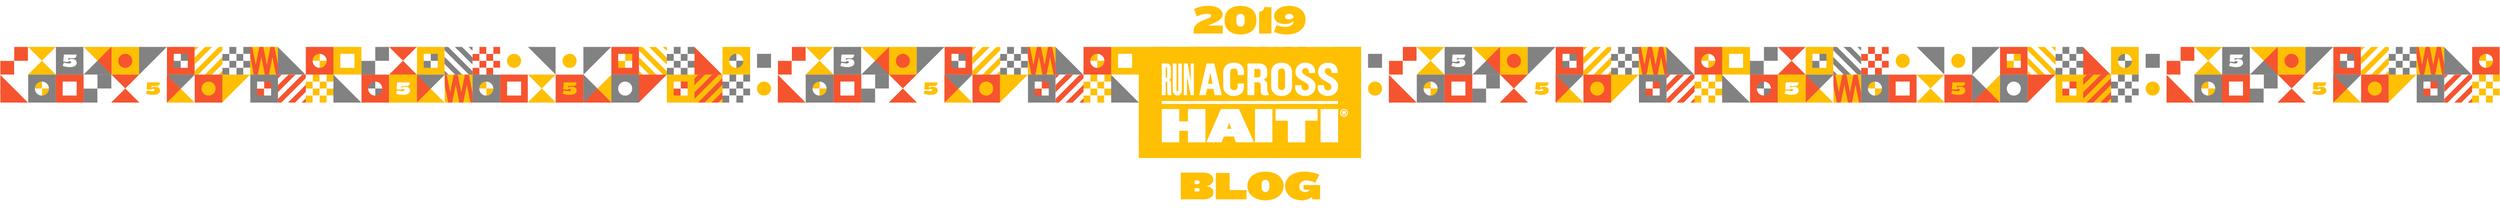 RAH_Blog Assets_v1_Small Logo Banner.png